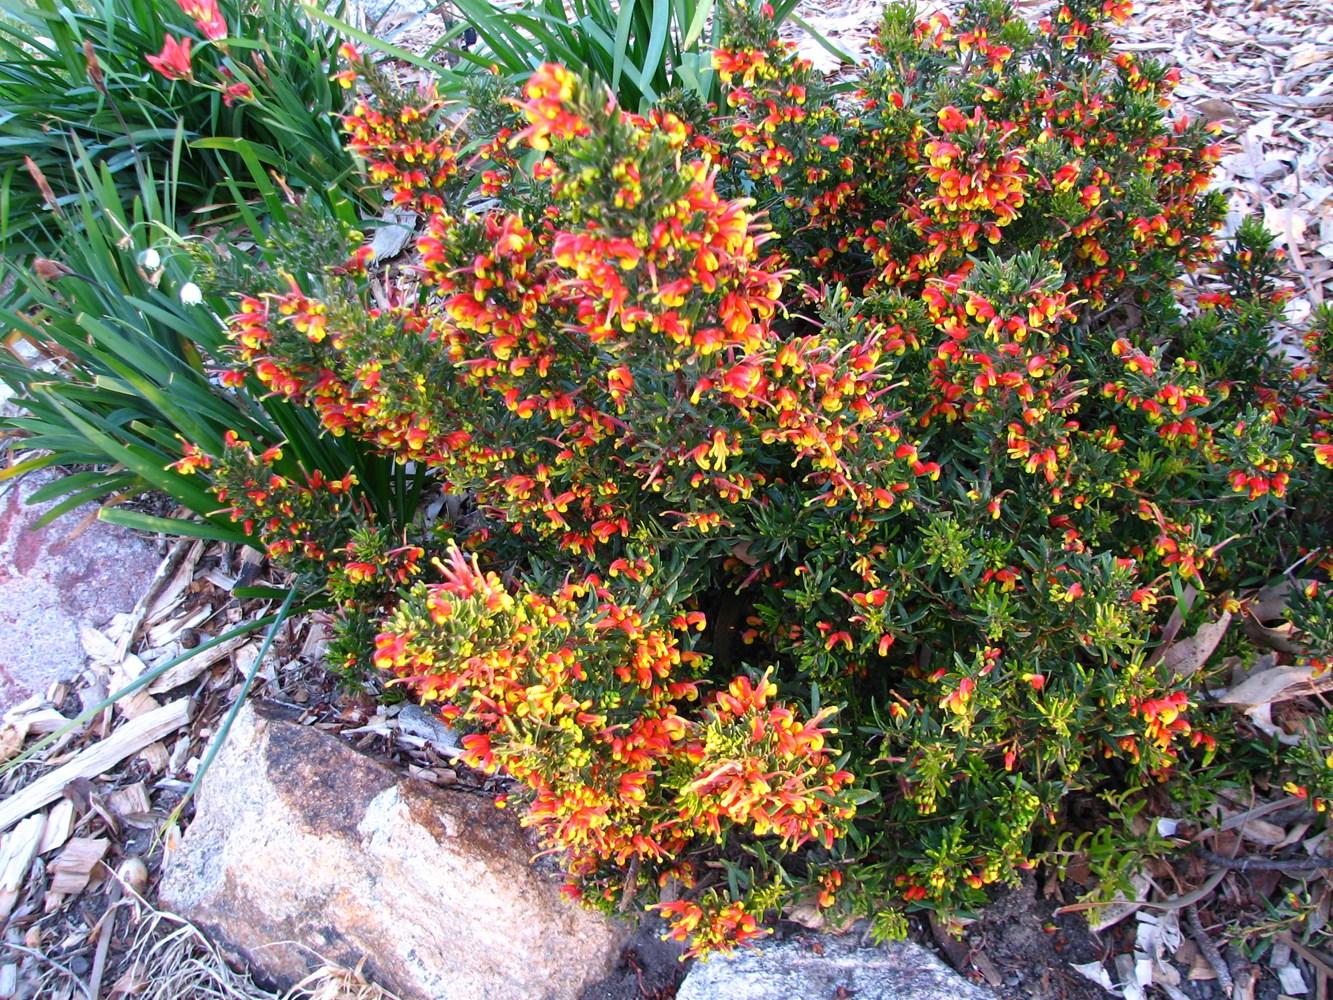 Website/Plants/1652873765/Images/Gallery/g_firecracker_05.0.JPG